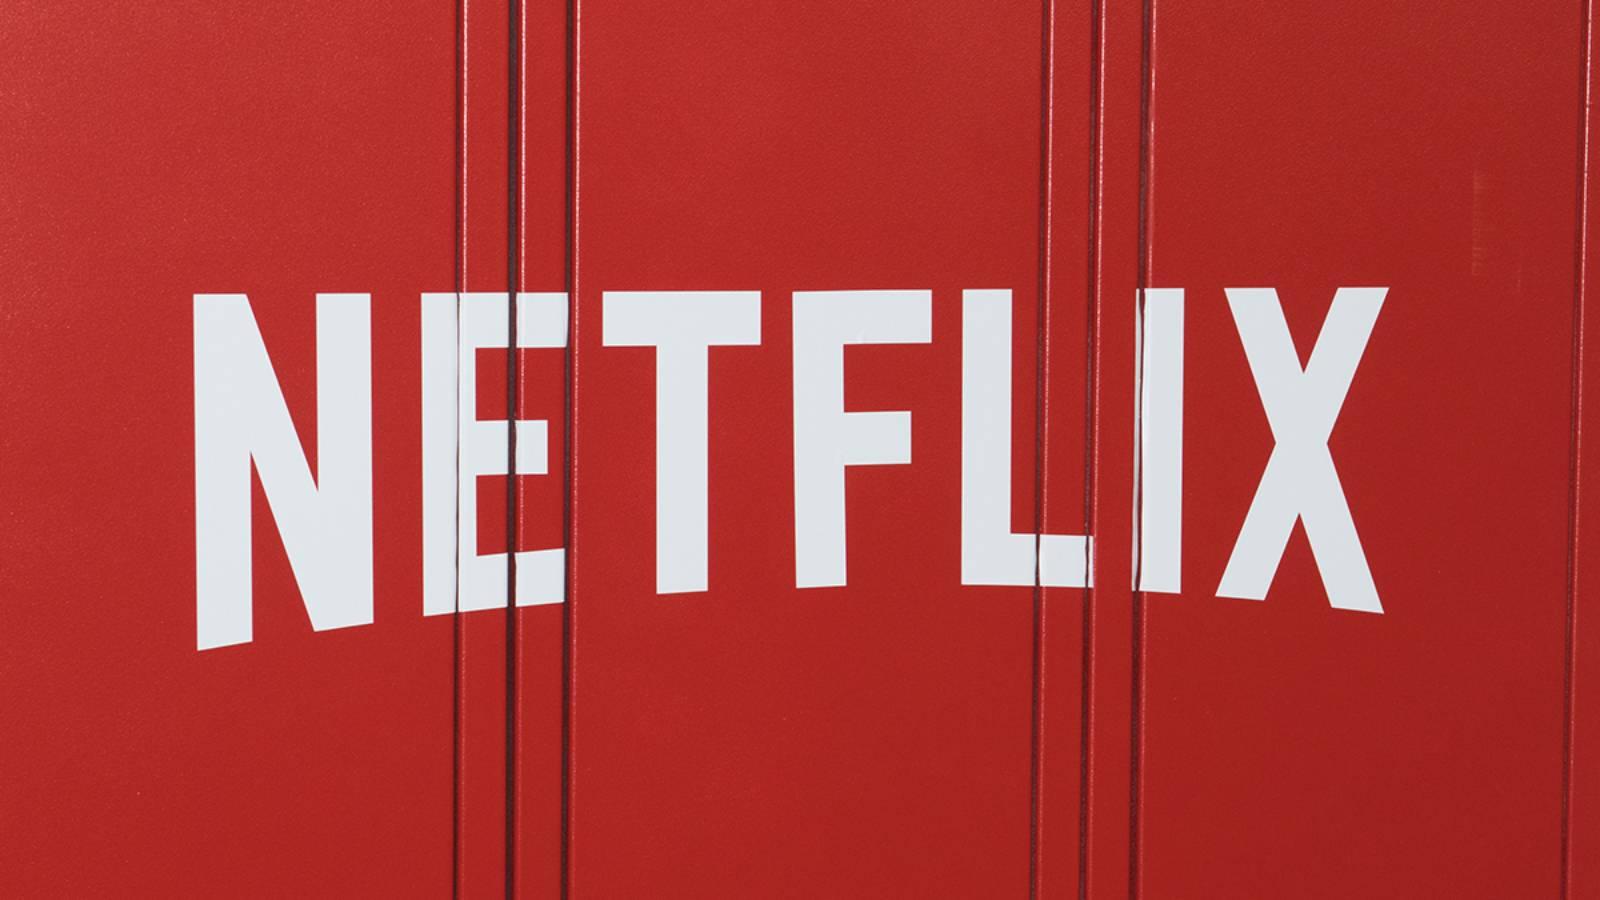 Netflix continut